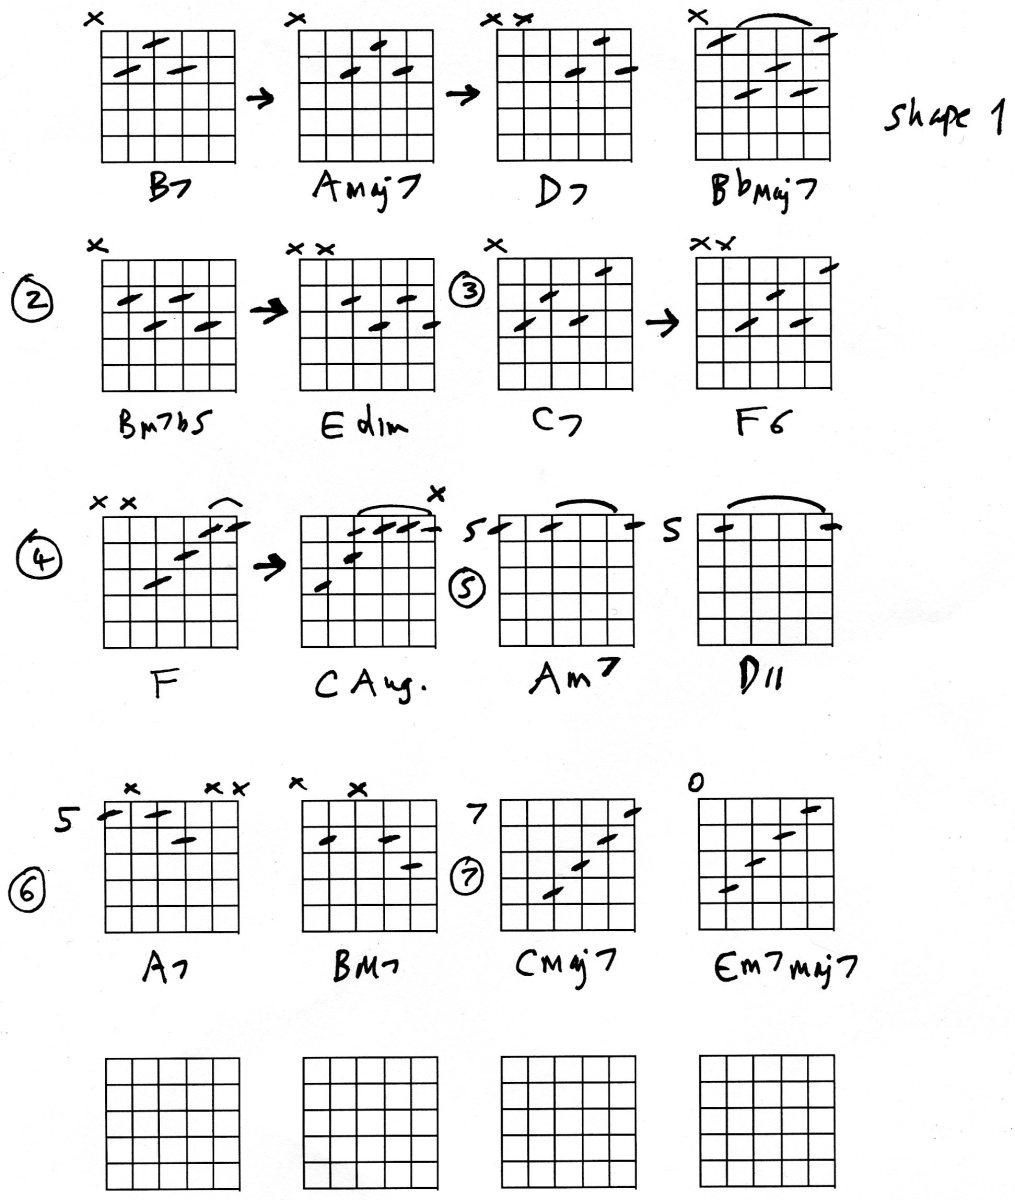 Electric Guitar Chords Advanced : guitar chords advanced ~ Russianpoet.info Haus und Dekorationen